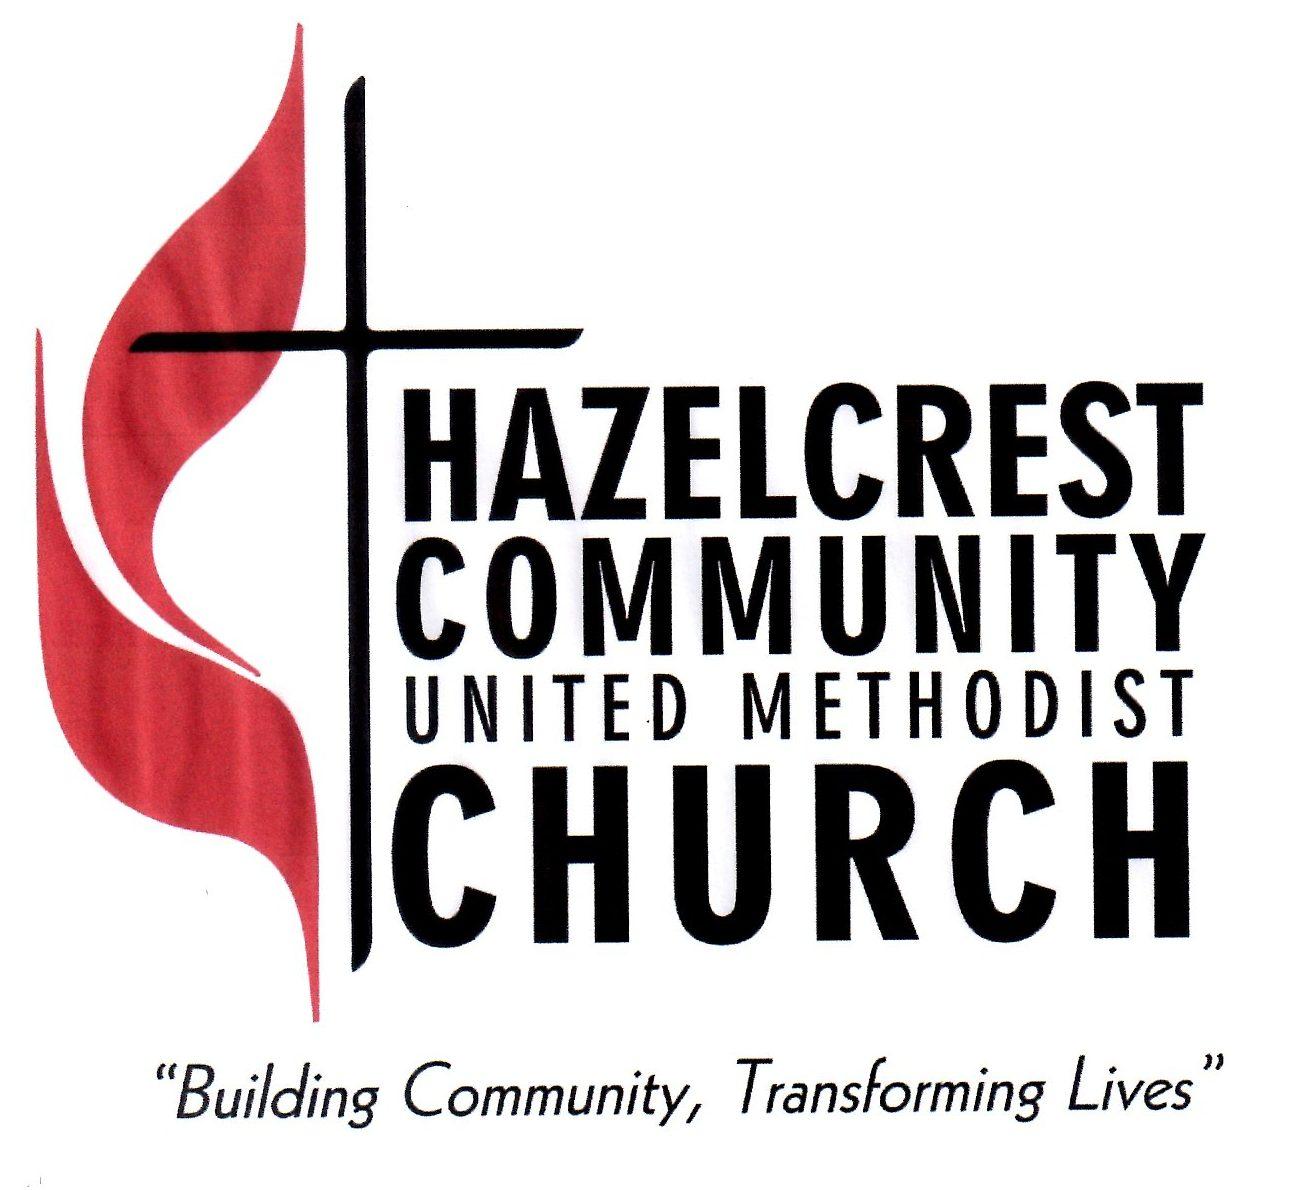 Hazel Crest Community United Methodist Church